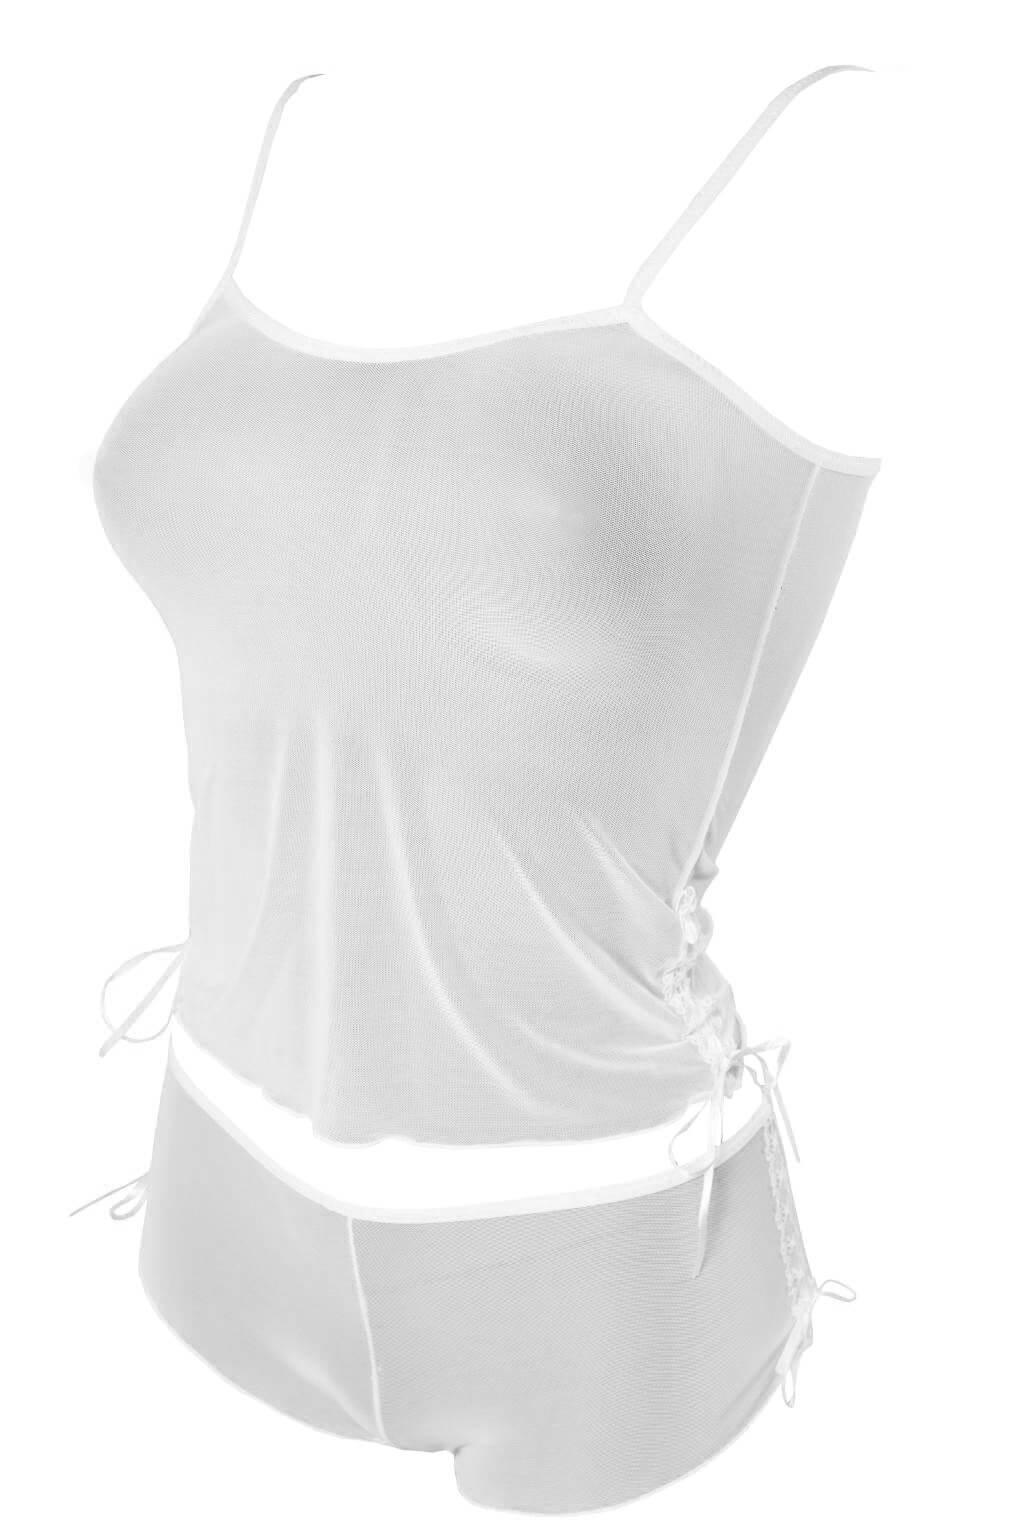 Selma komplet podprsenka + kalhotky M bílá